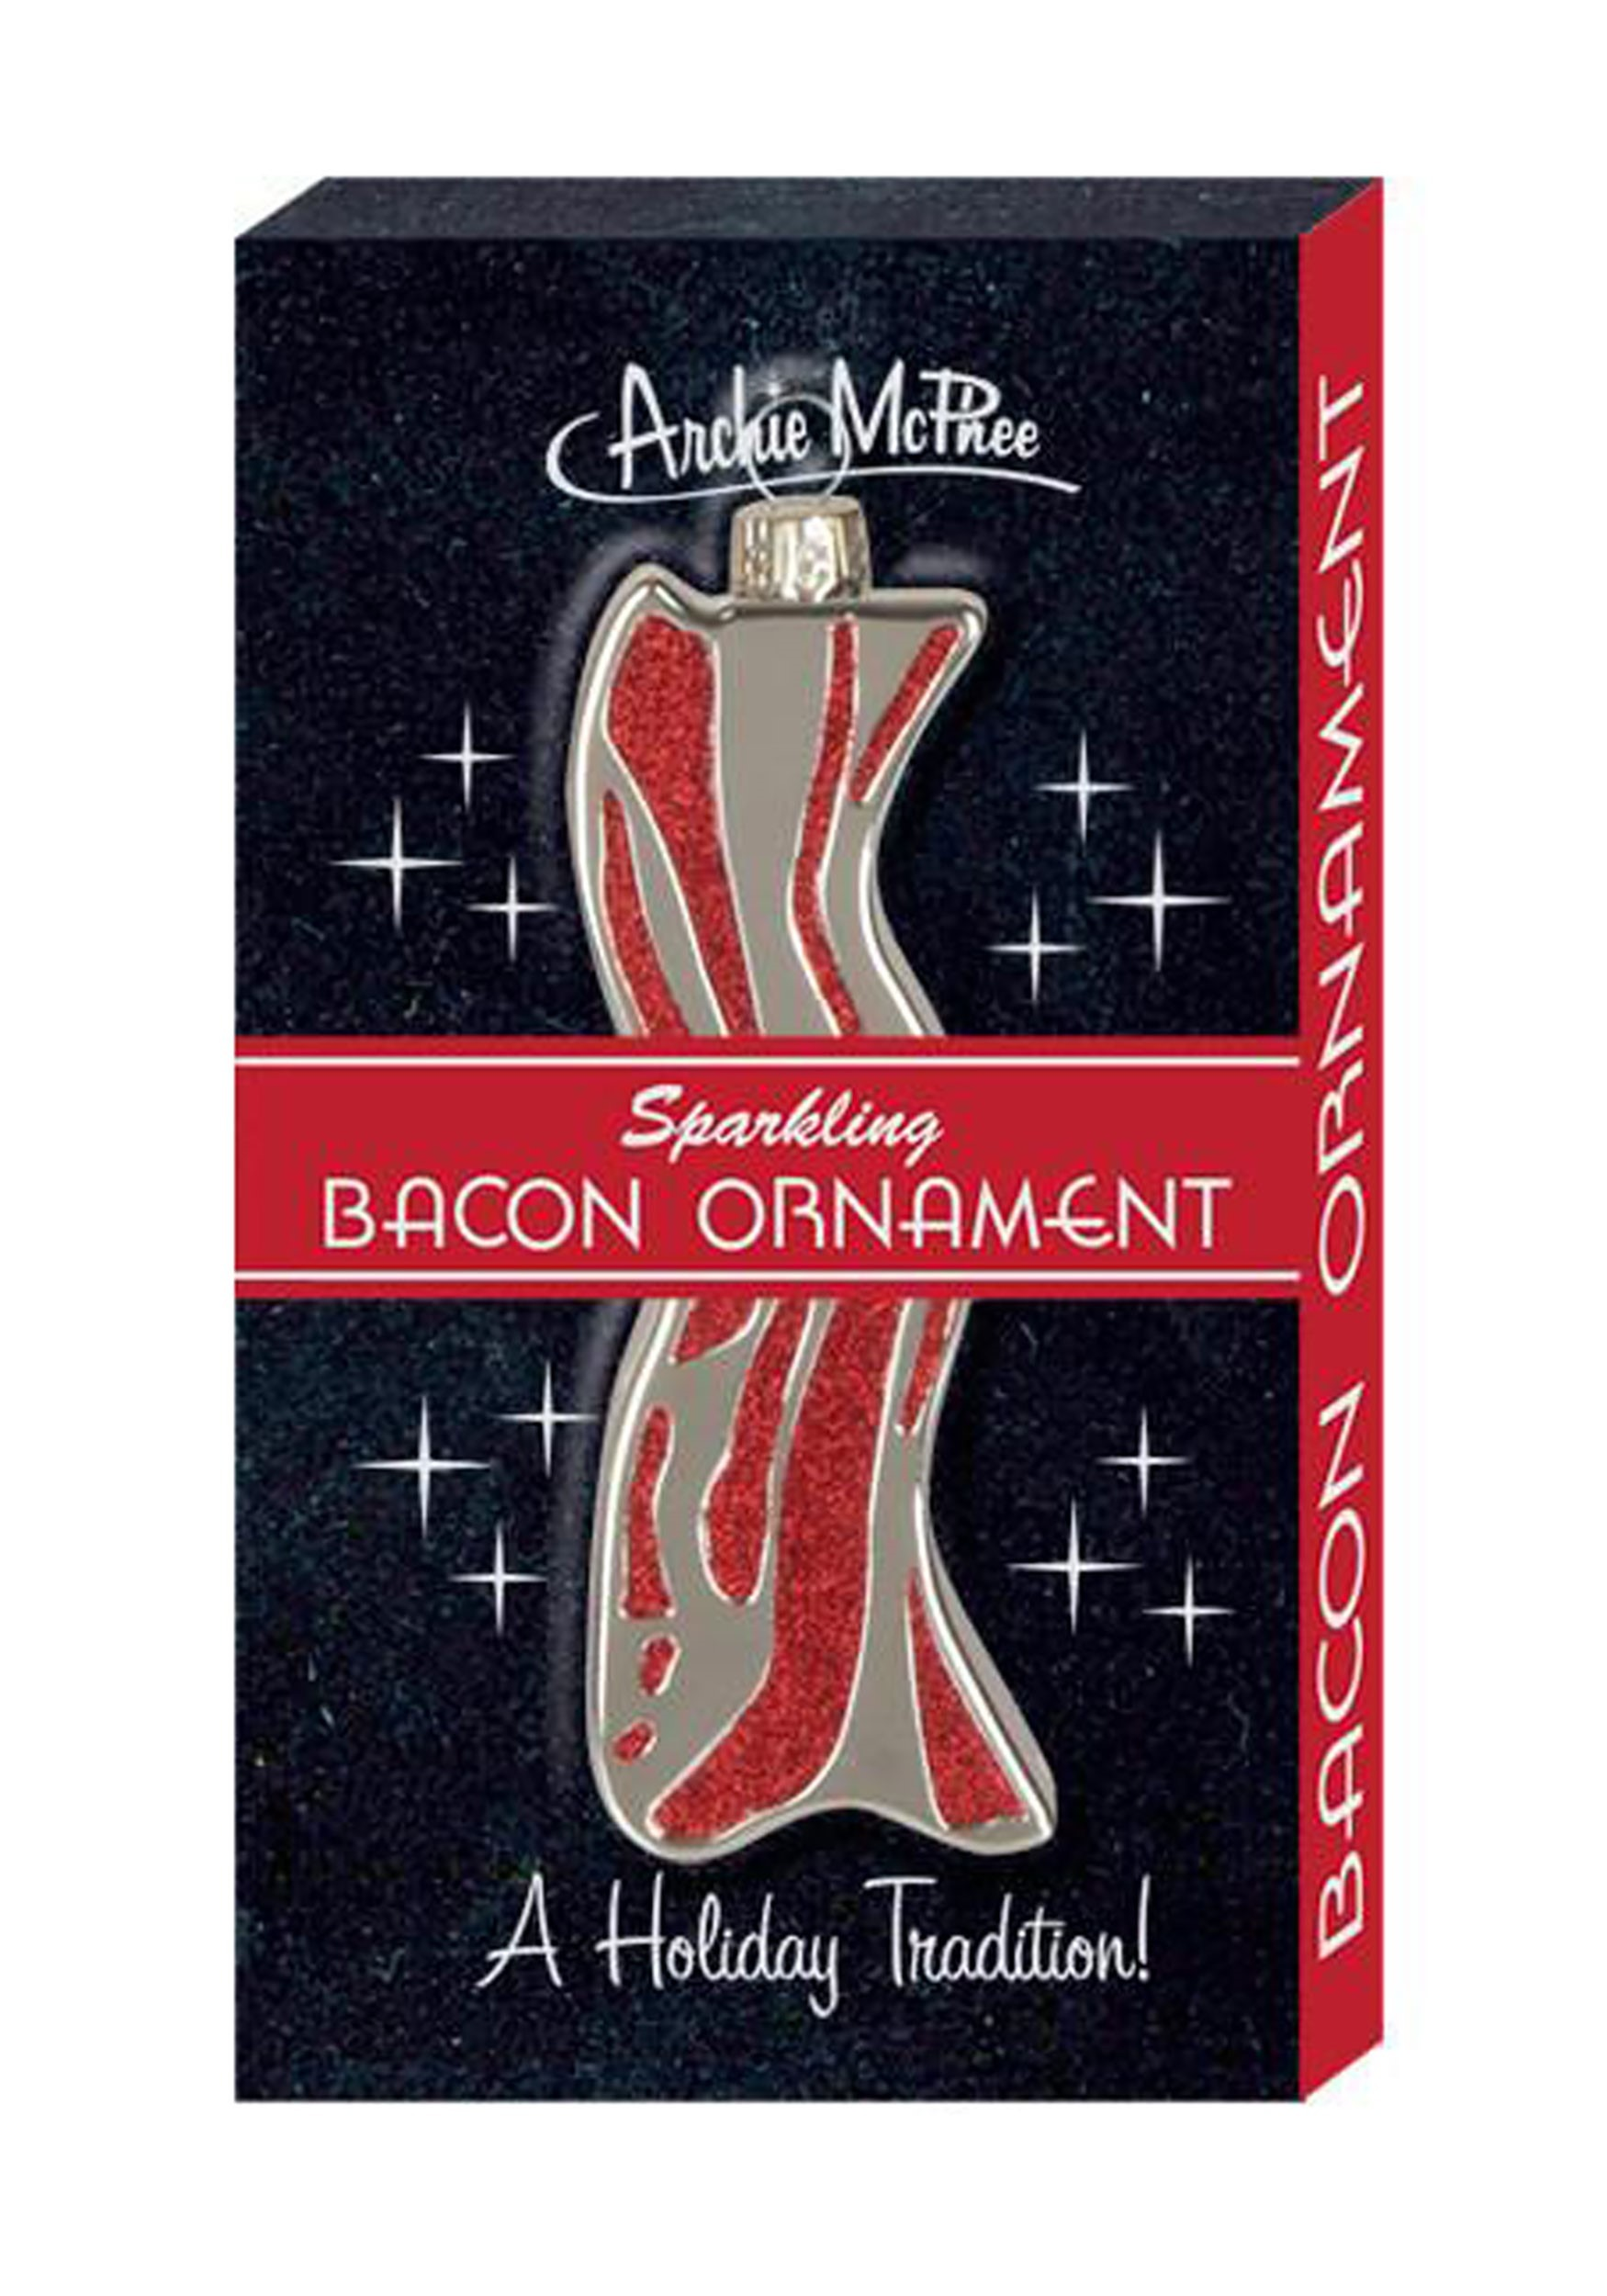 Sparkling_Bacon_Ornament